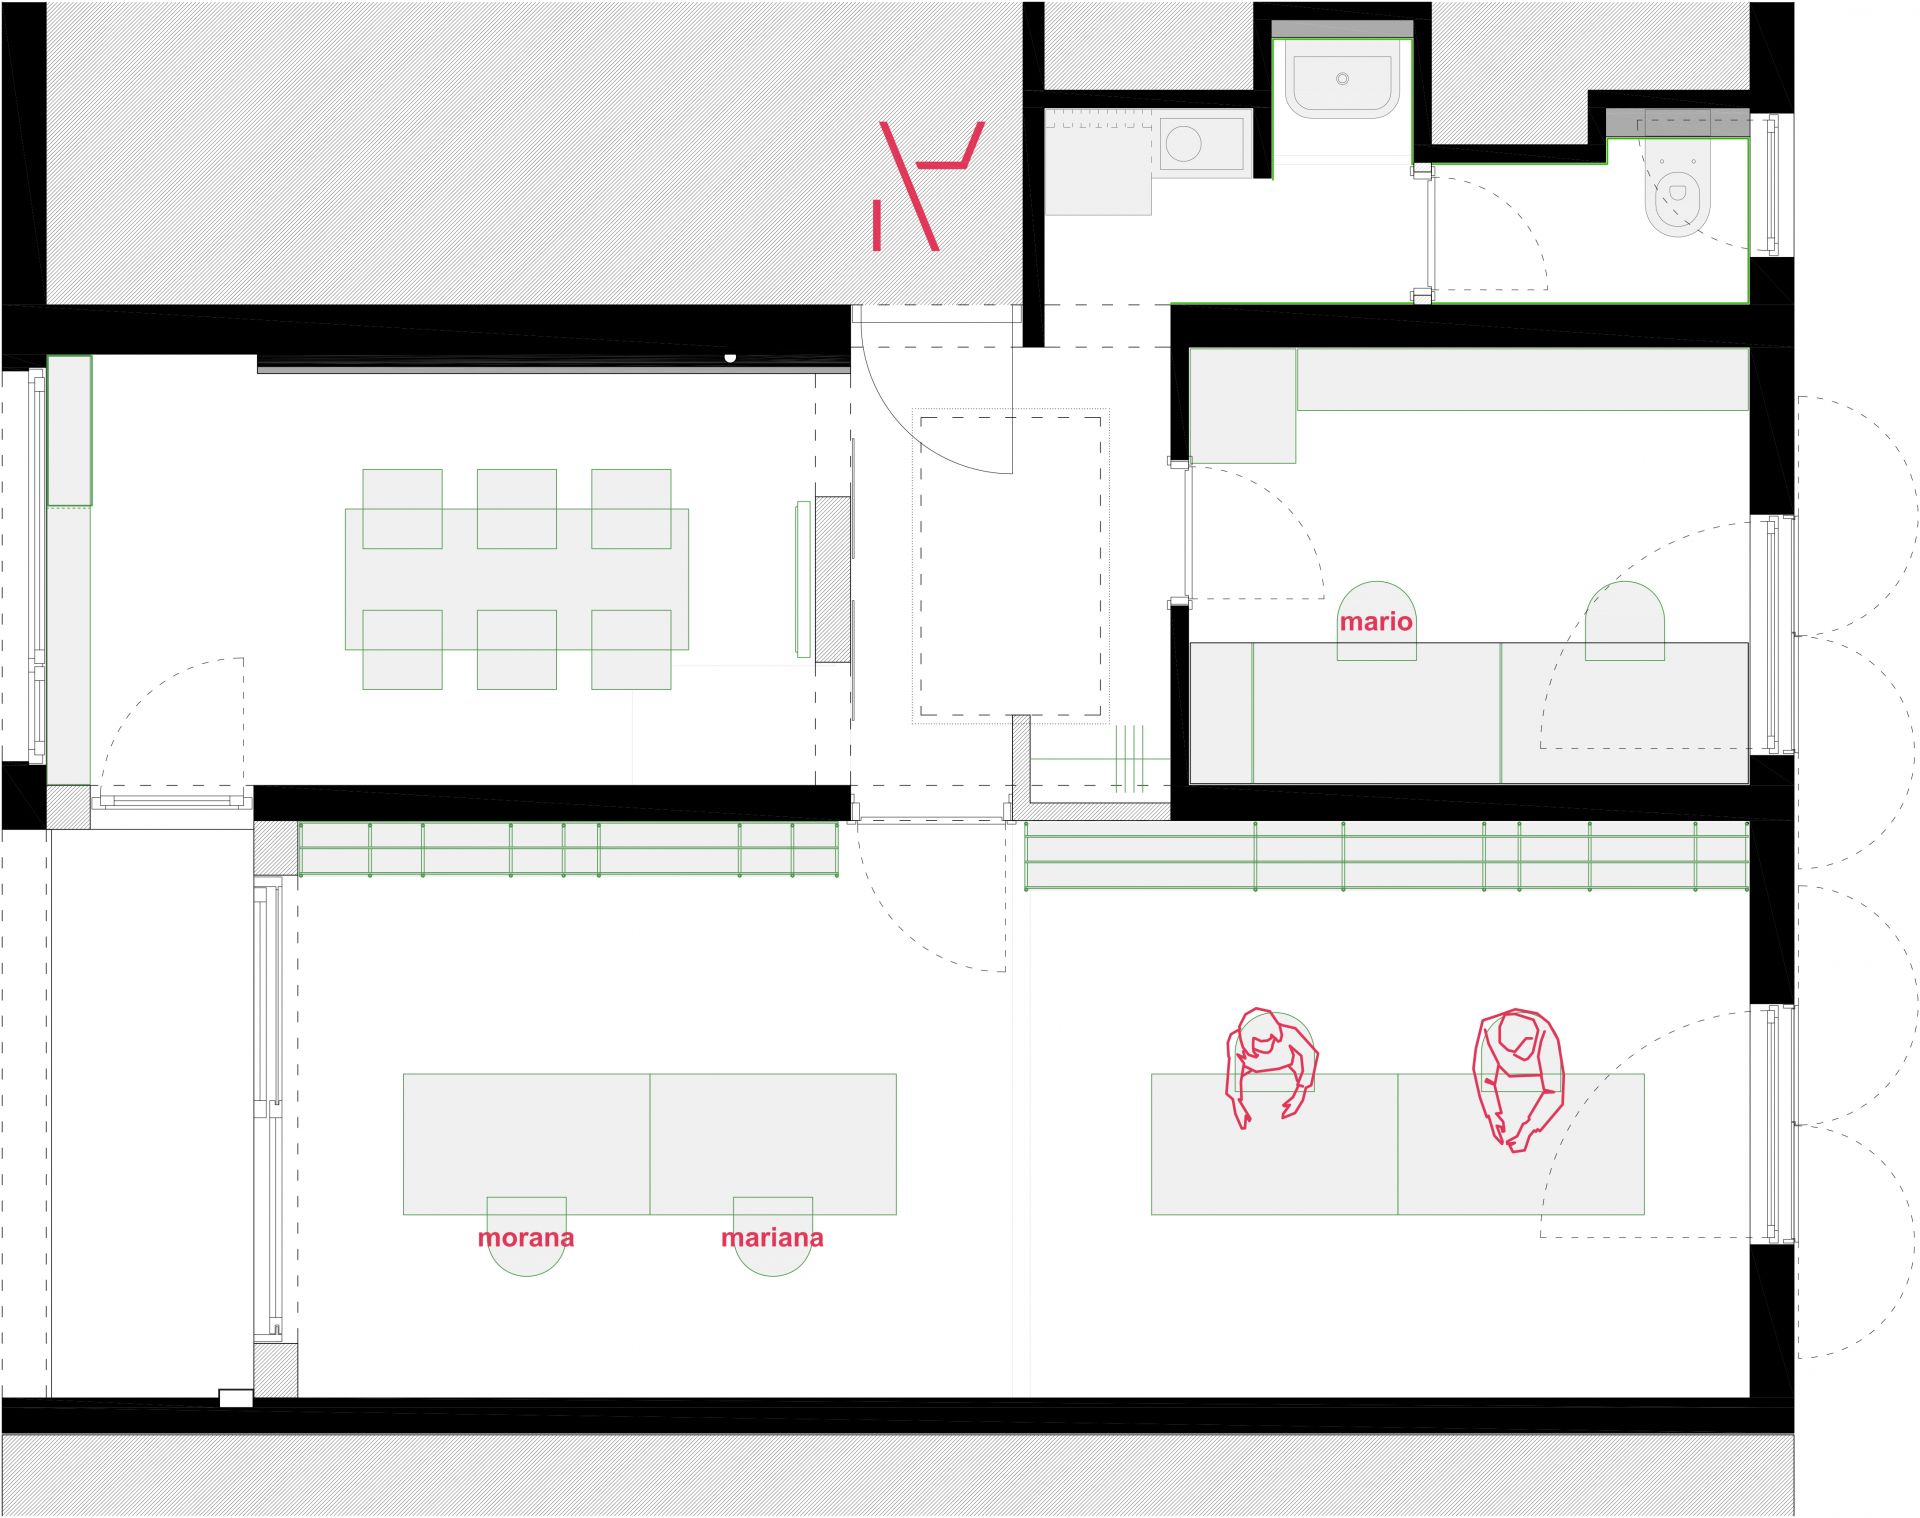 Arhitektonski Kolektiv (AK-47), Split